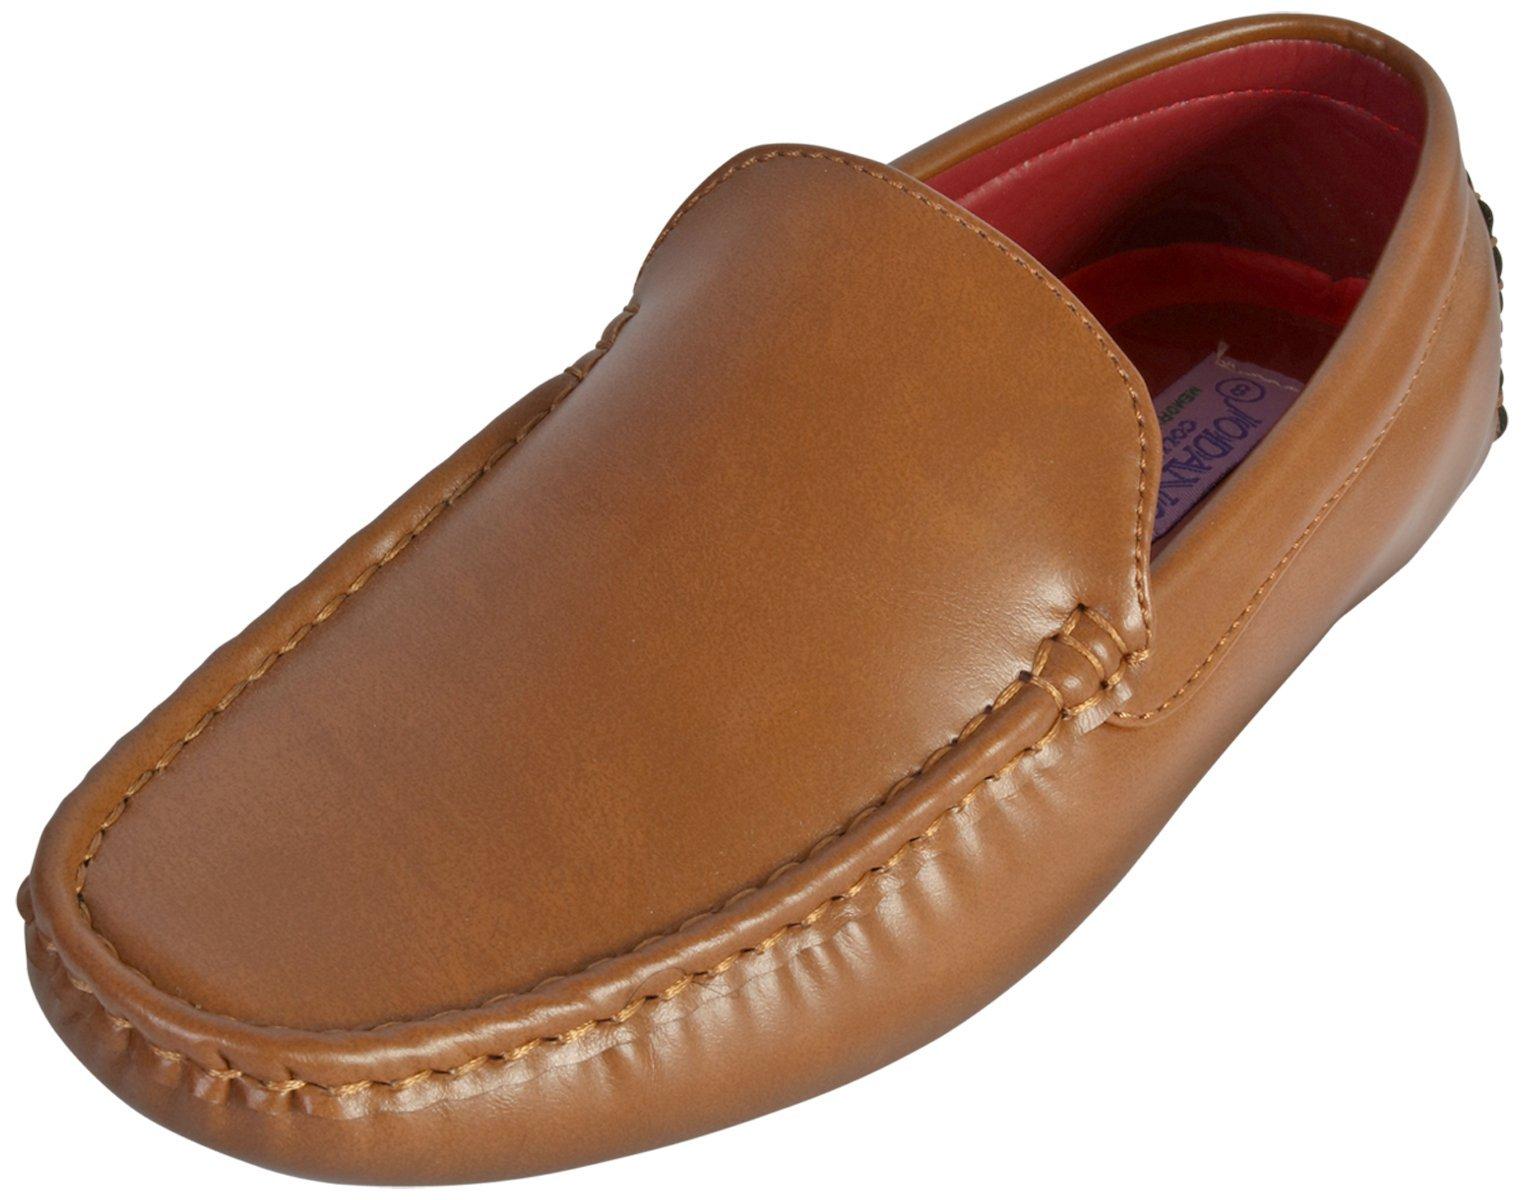 Jodano Collection Boys Classic Slip On Loafer Shoe, Tan, 4 M US Big Kid'